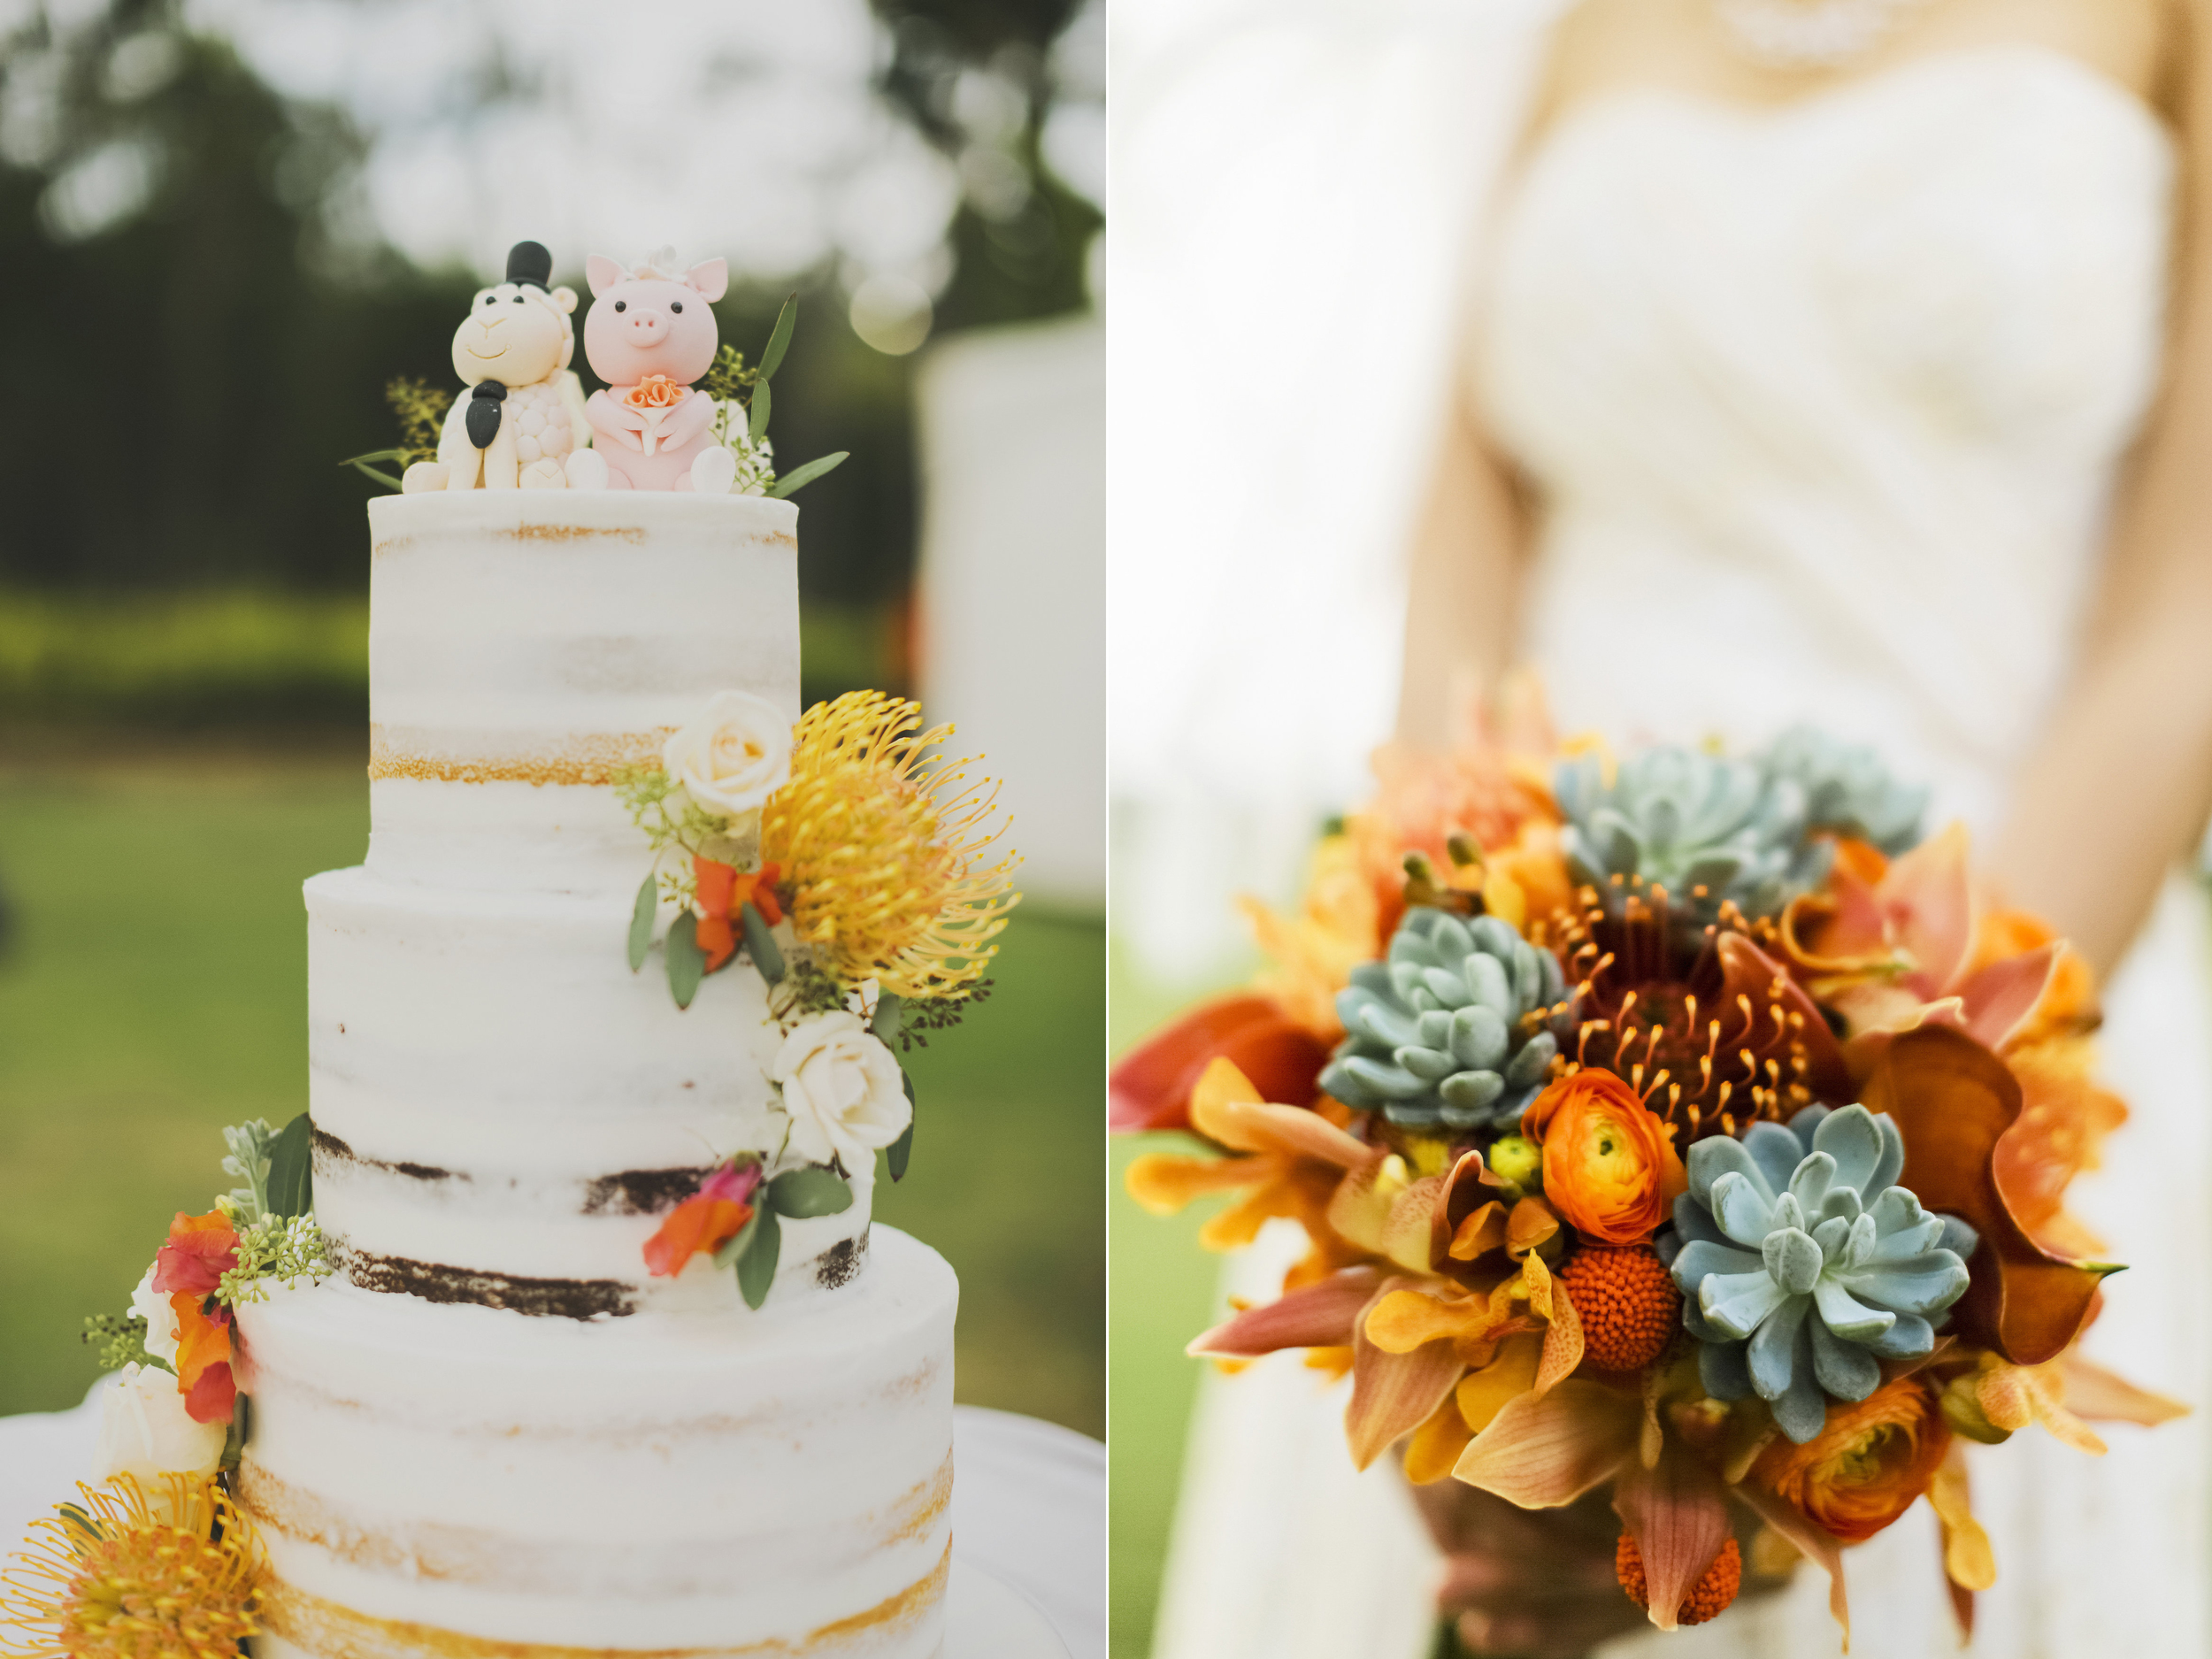 angie-diaz-photography-oahu-wedding-lanikuhonoa-shenshen-marshall-57.jpg